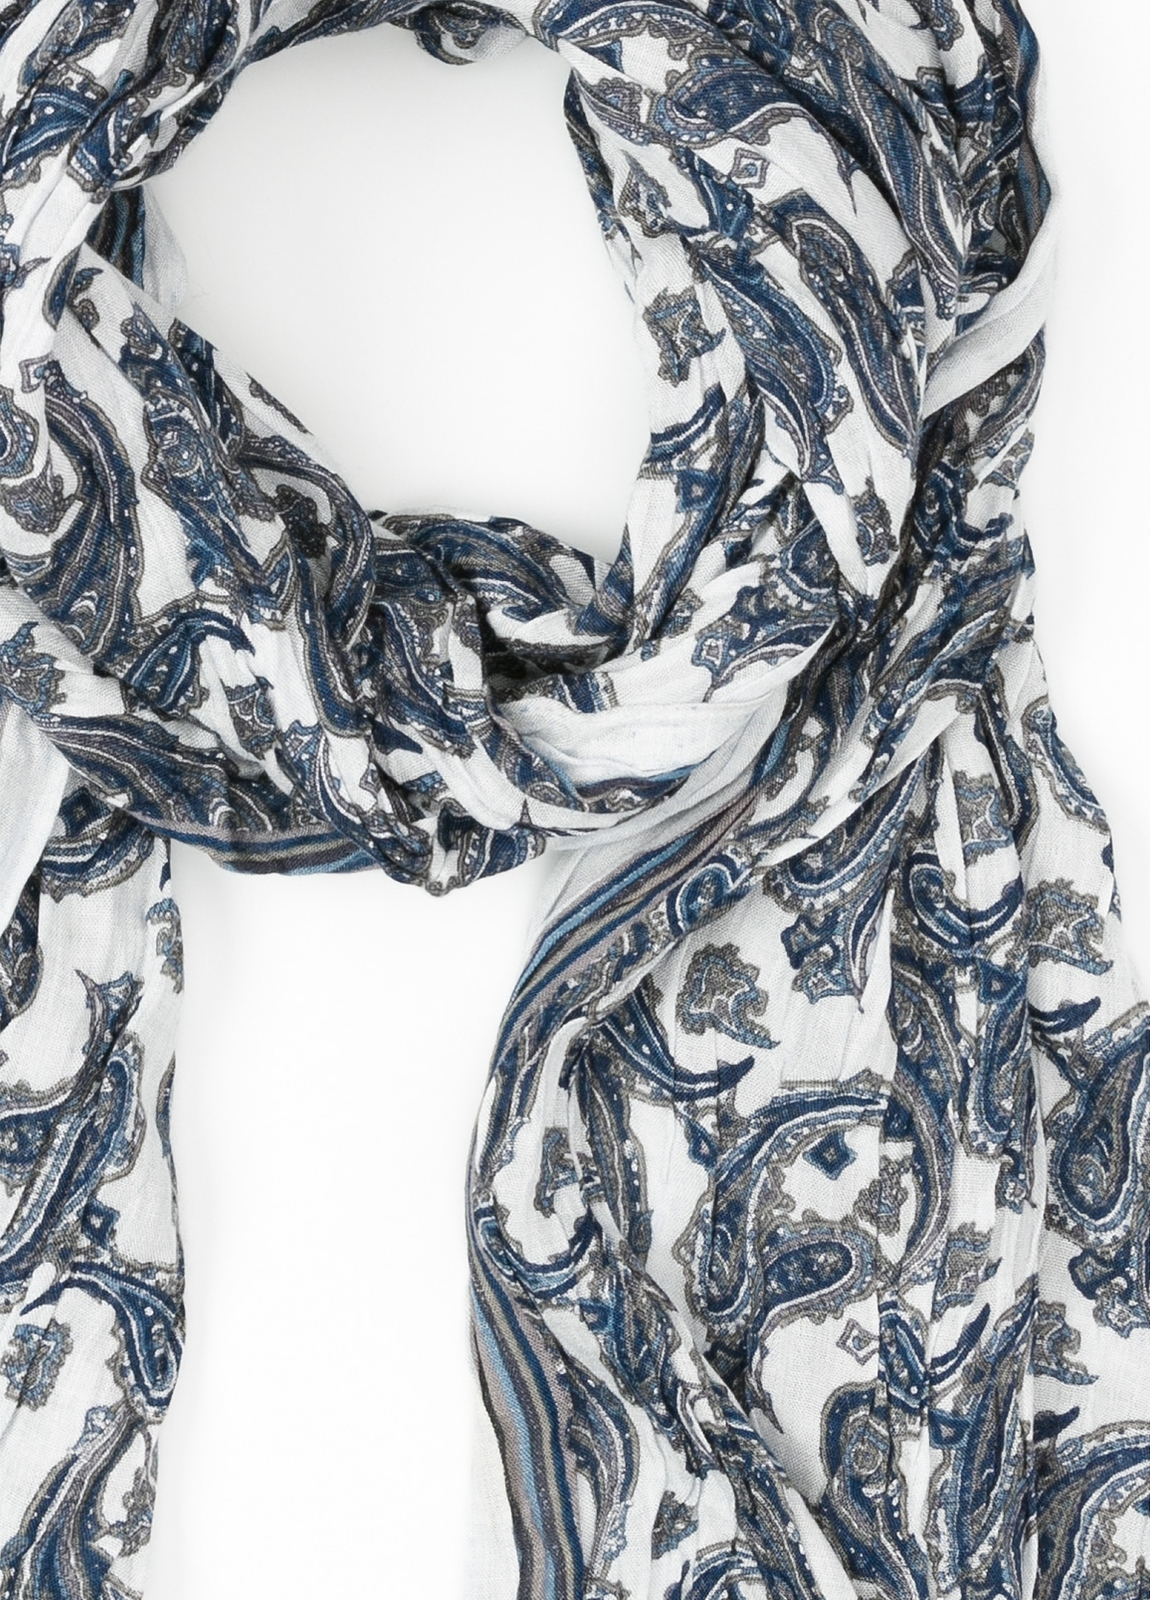 Foulard estampado étnico color azul, 60 x 185 cm. 85% Viscosa 15% Lana virgen. - Ítem1